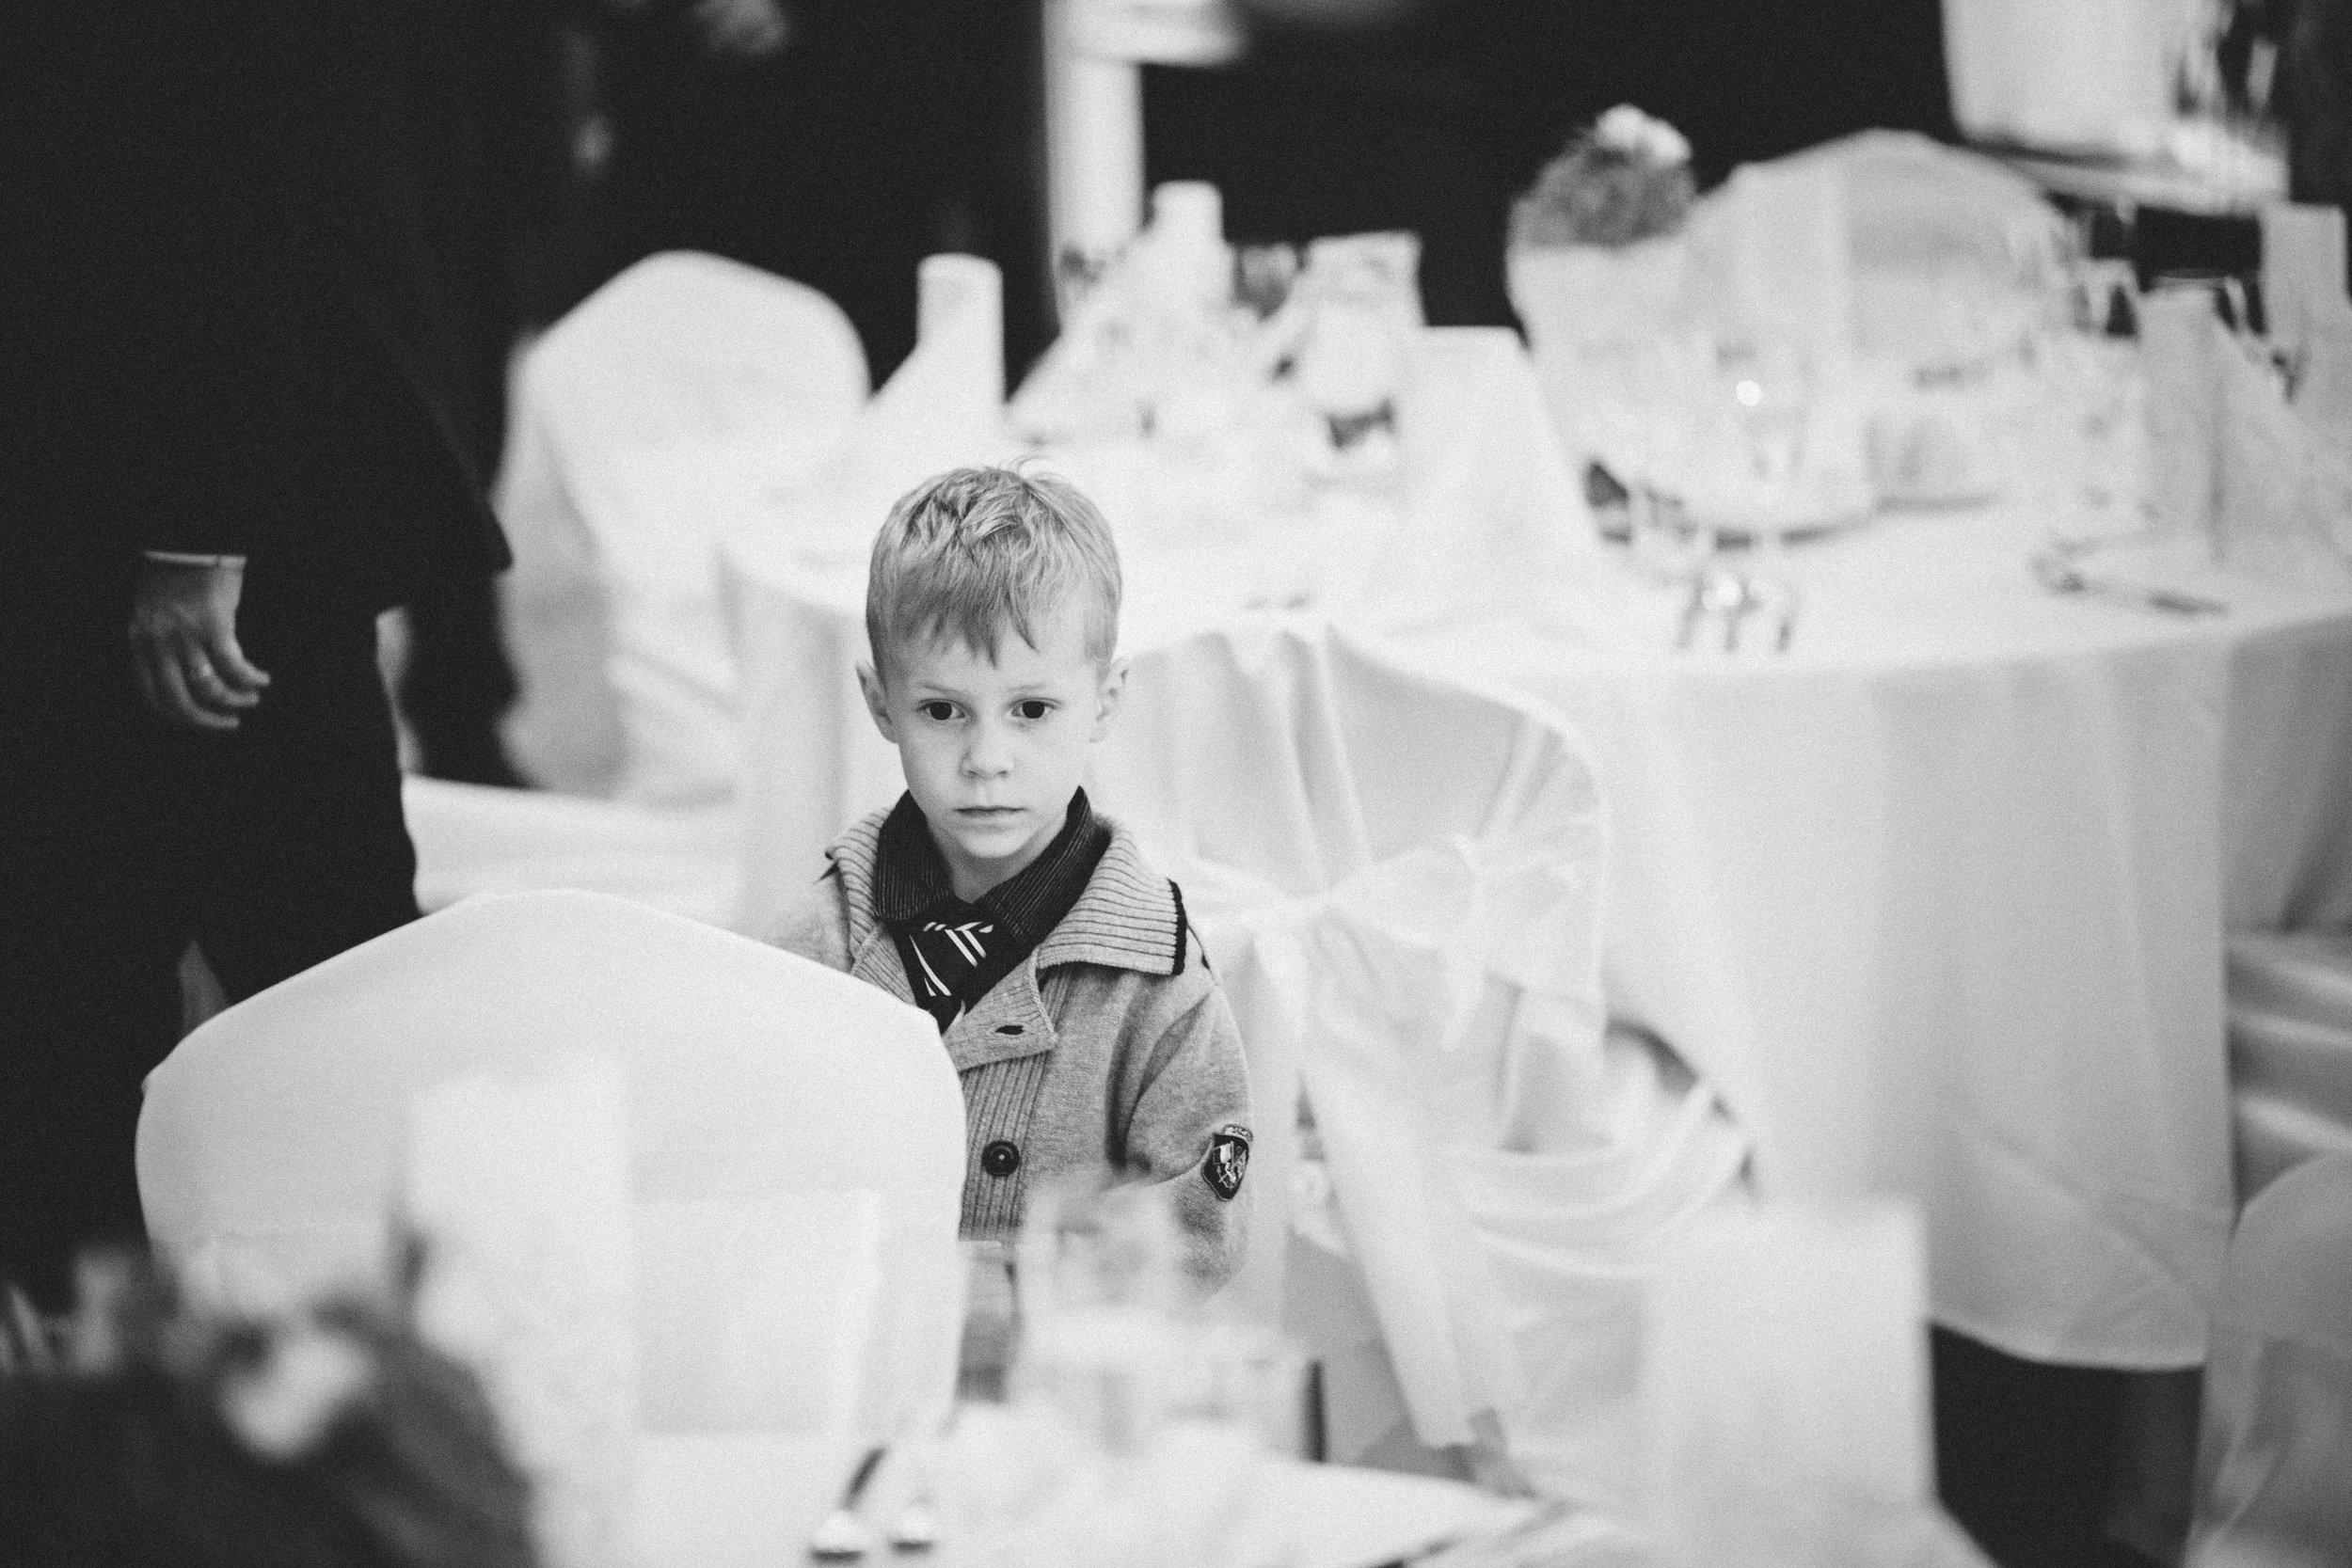 destination-wedding-photographer-slovakia-bratislava-bw-kid-documentary-style-1.jpg